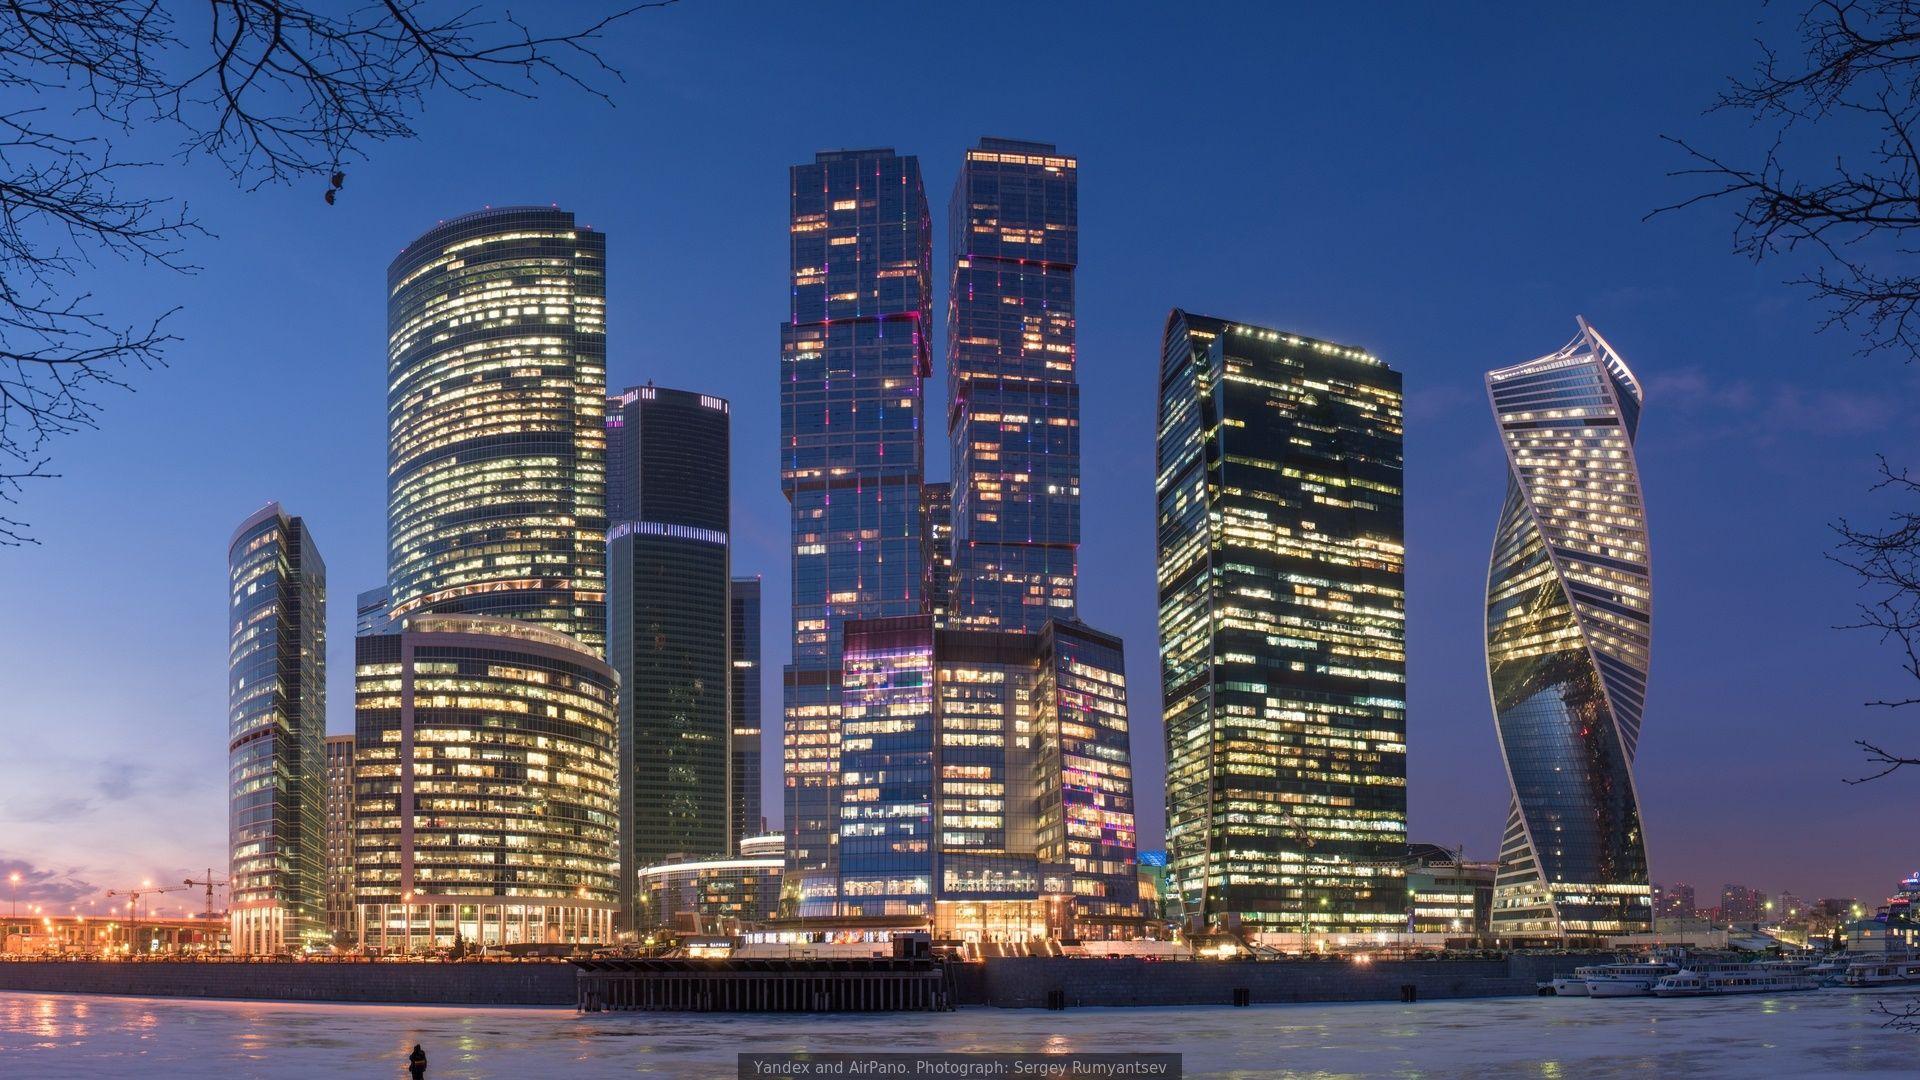 russia international business - HD1920×1080